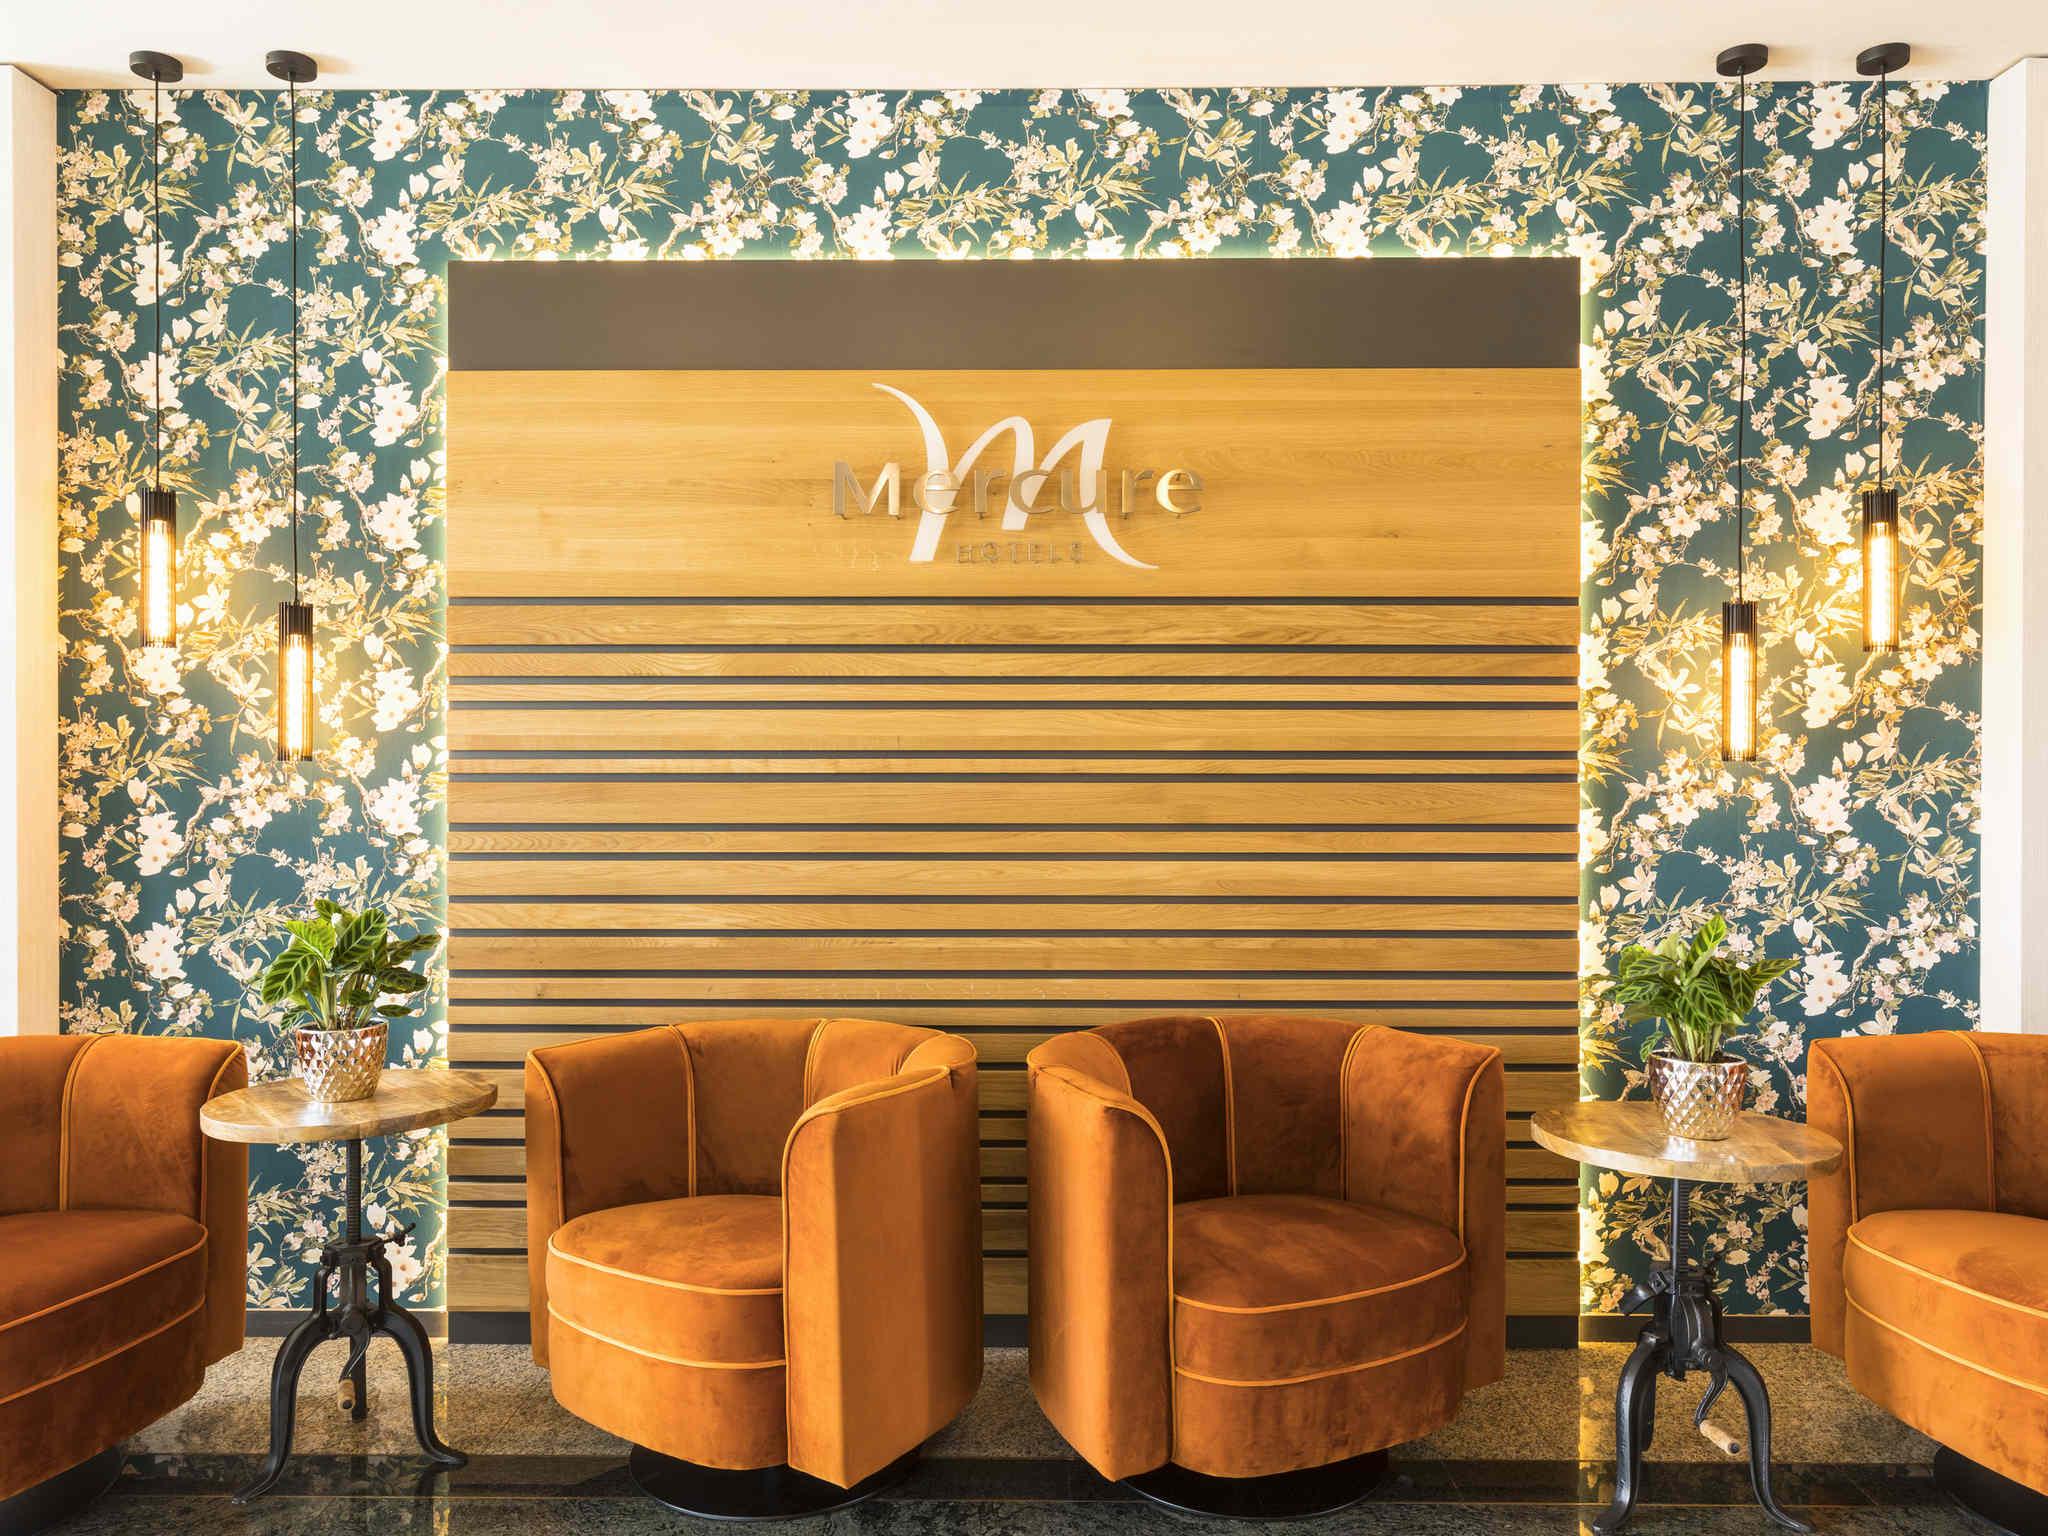 mercure hotel bad oeynhausen city book now free wifi. Black Bedroom Furniture Sets. Home Design Ideas